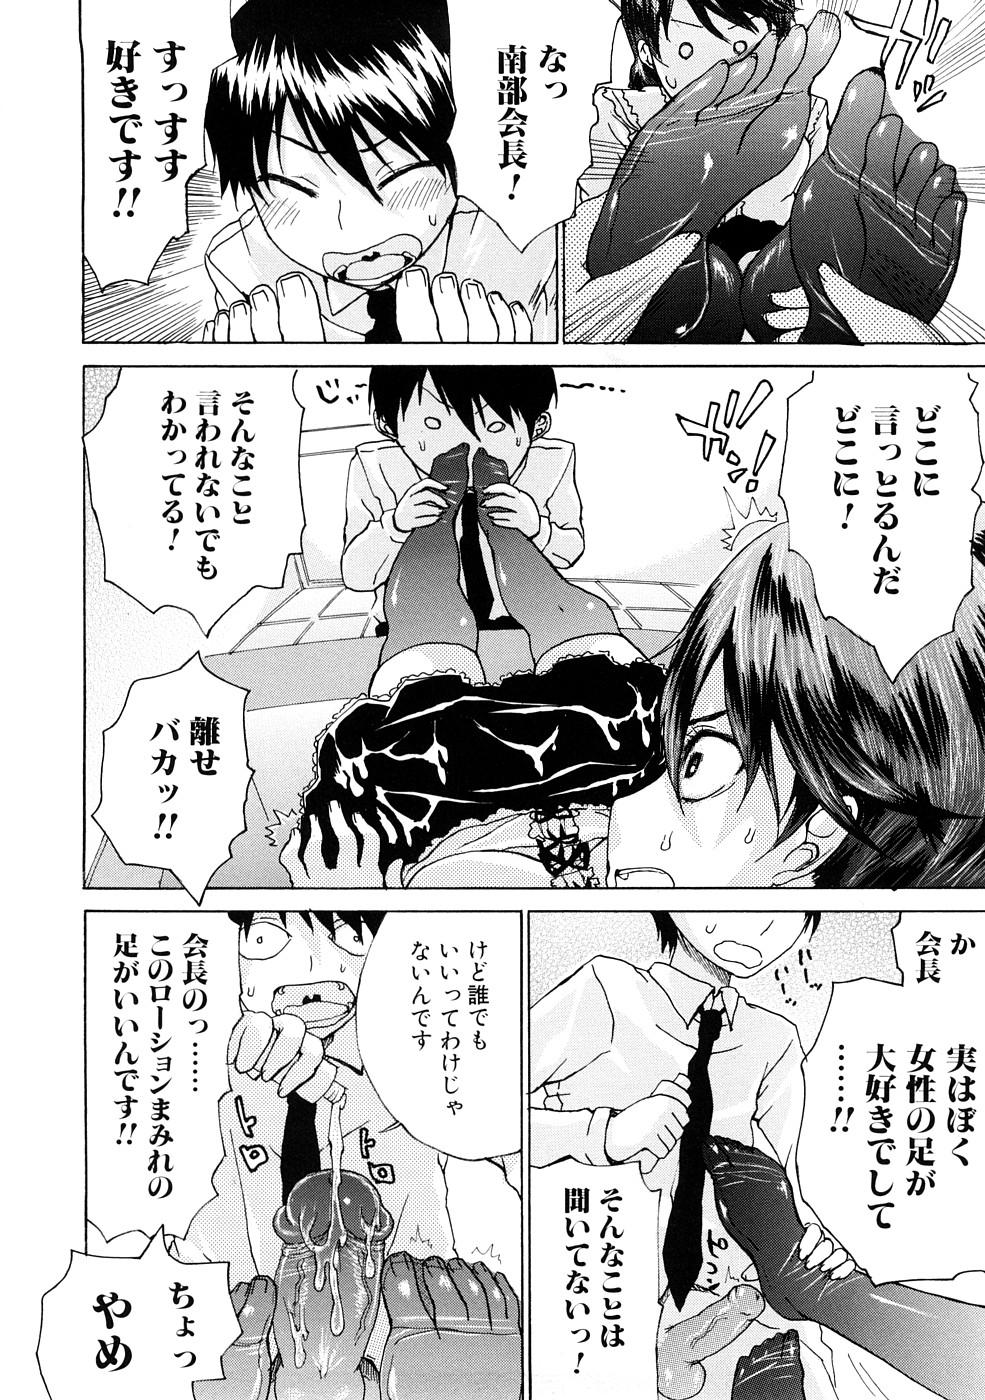 Ecchi de Jibunkatte de Kawaii Ko 137